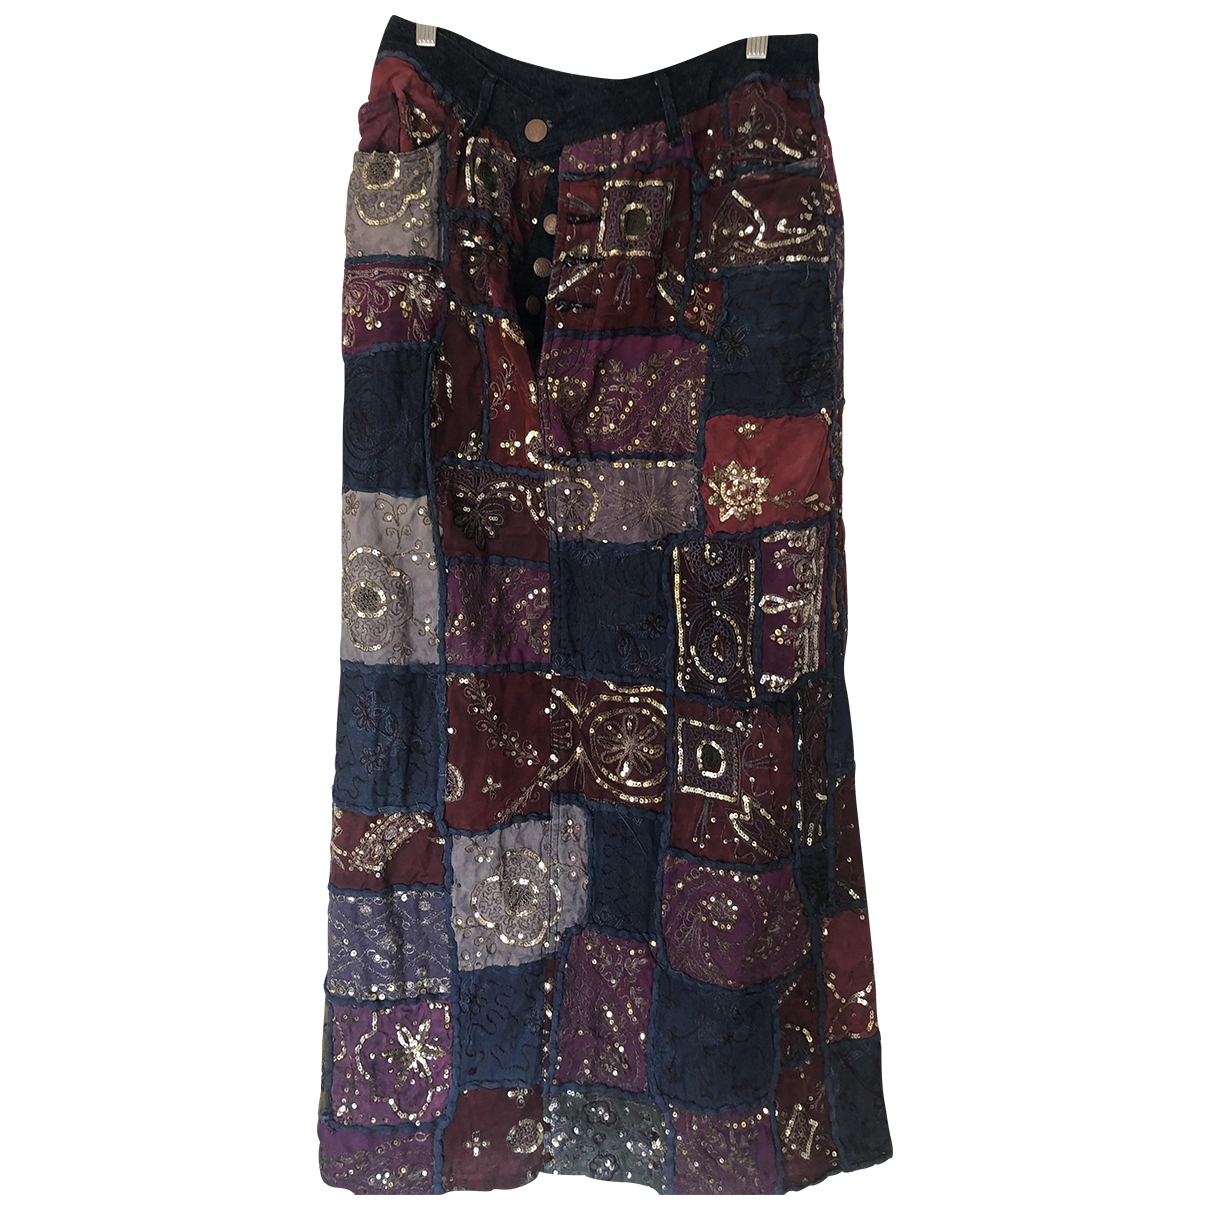 Jean Paul Gaultier \N Multicolour Denim - Jeans skirt for Women L International